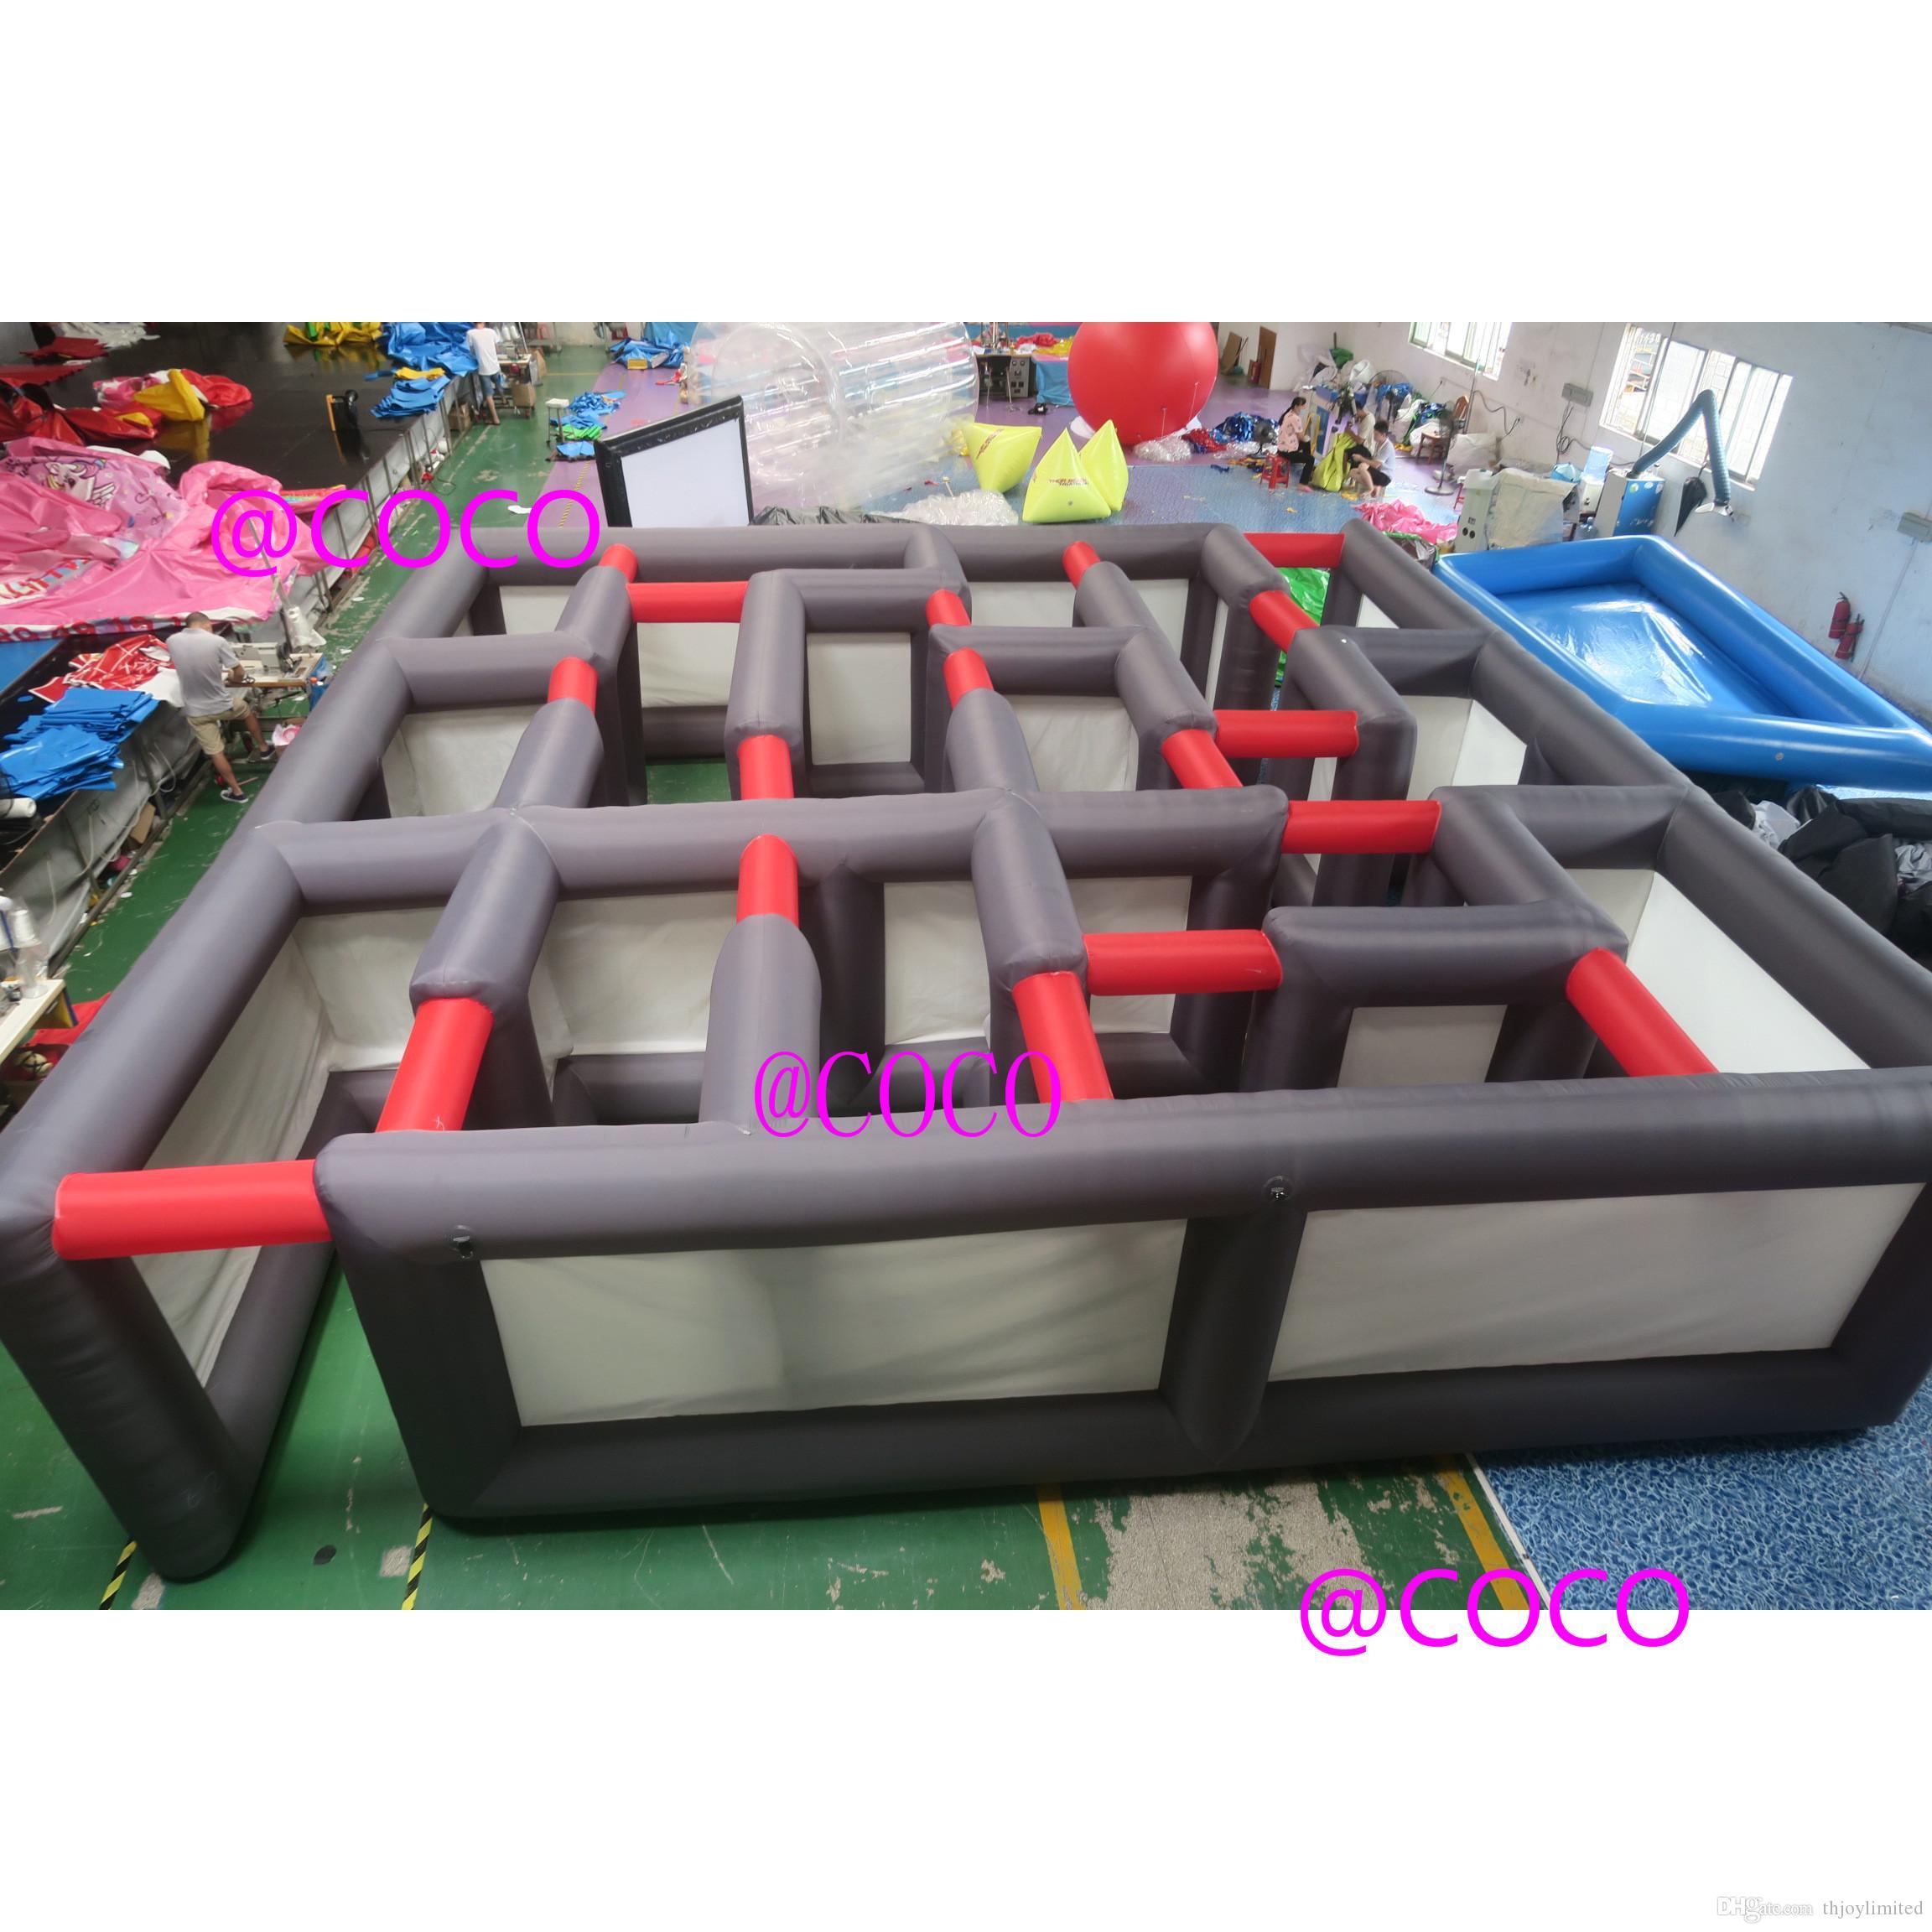 8x8m / 10x10m / 12x12m عملاق قابل للنفخ المتاهة للبيع، التجاري نفخ متاهة الوسم المتاهة متاهة لعبة الألغام